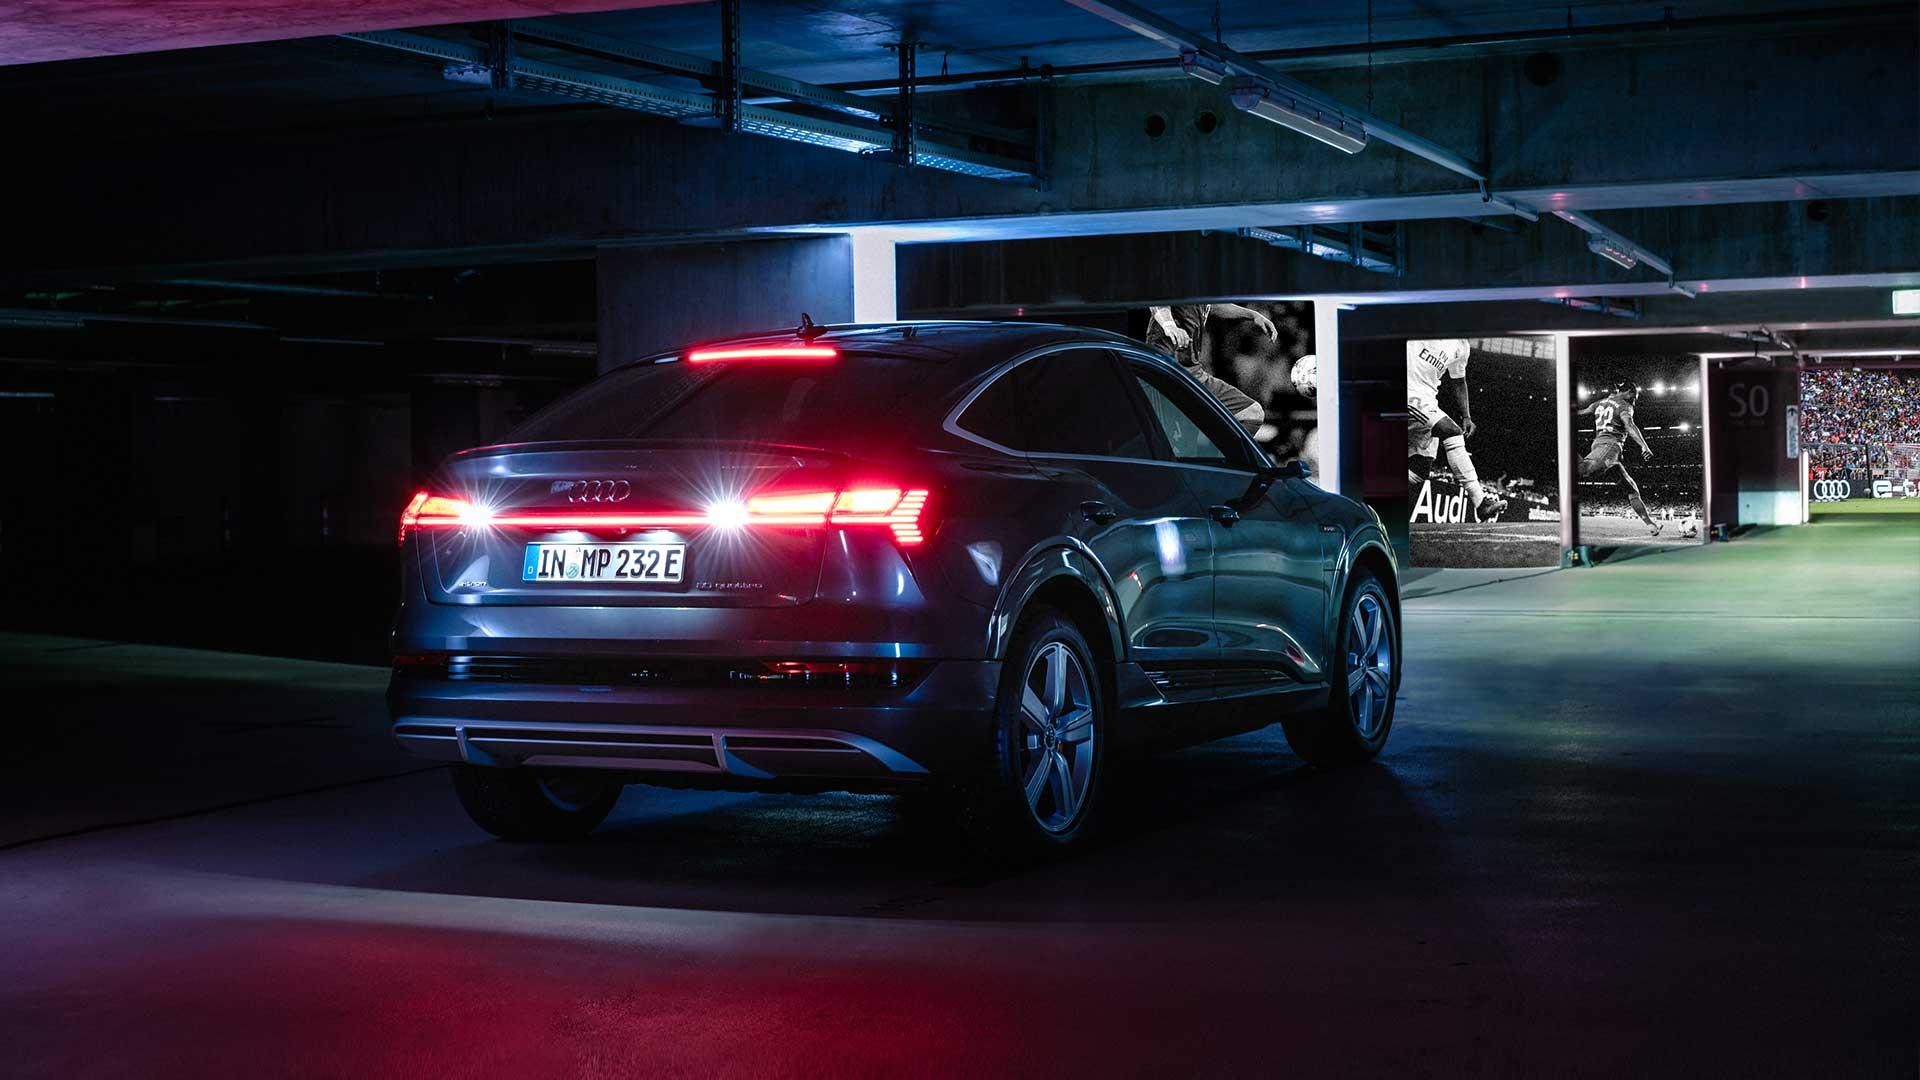 Kelebihan Auto Audi Murah Berkualitas